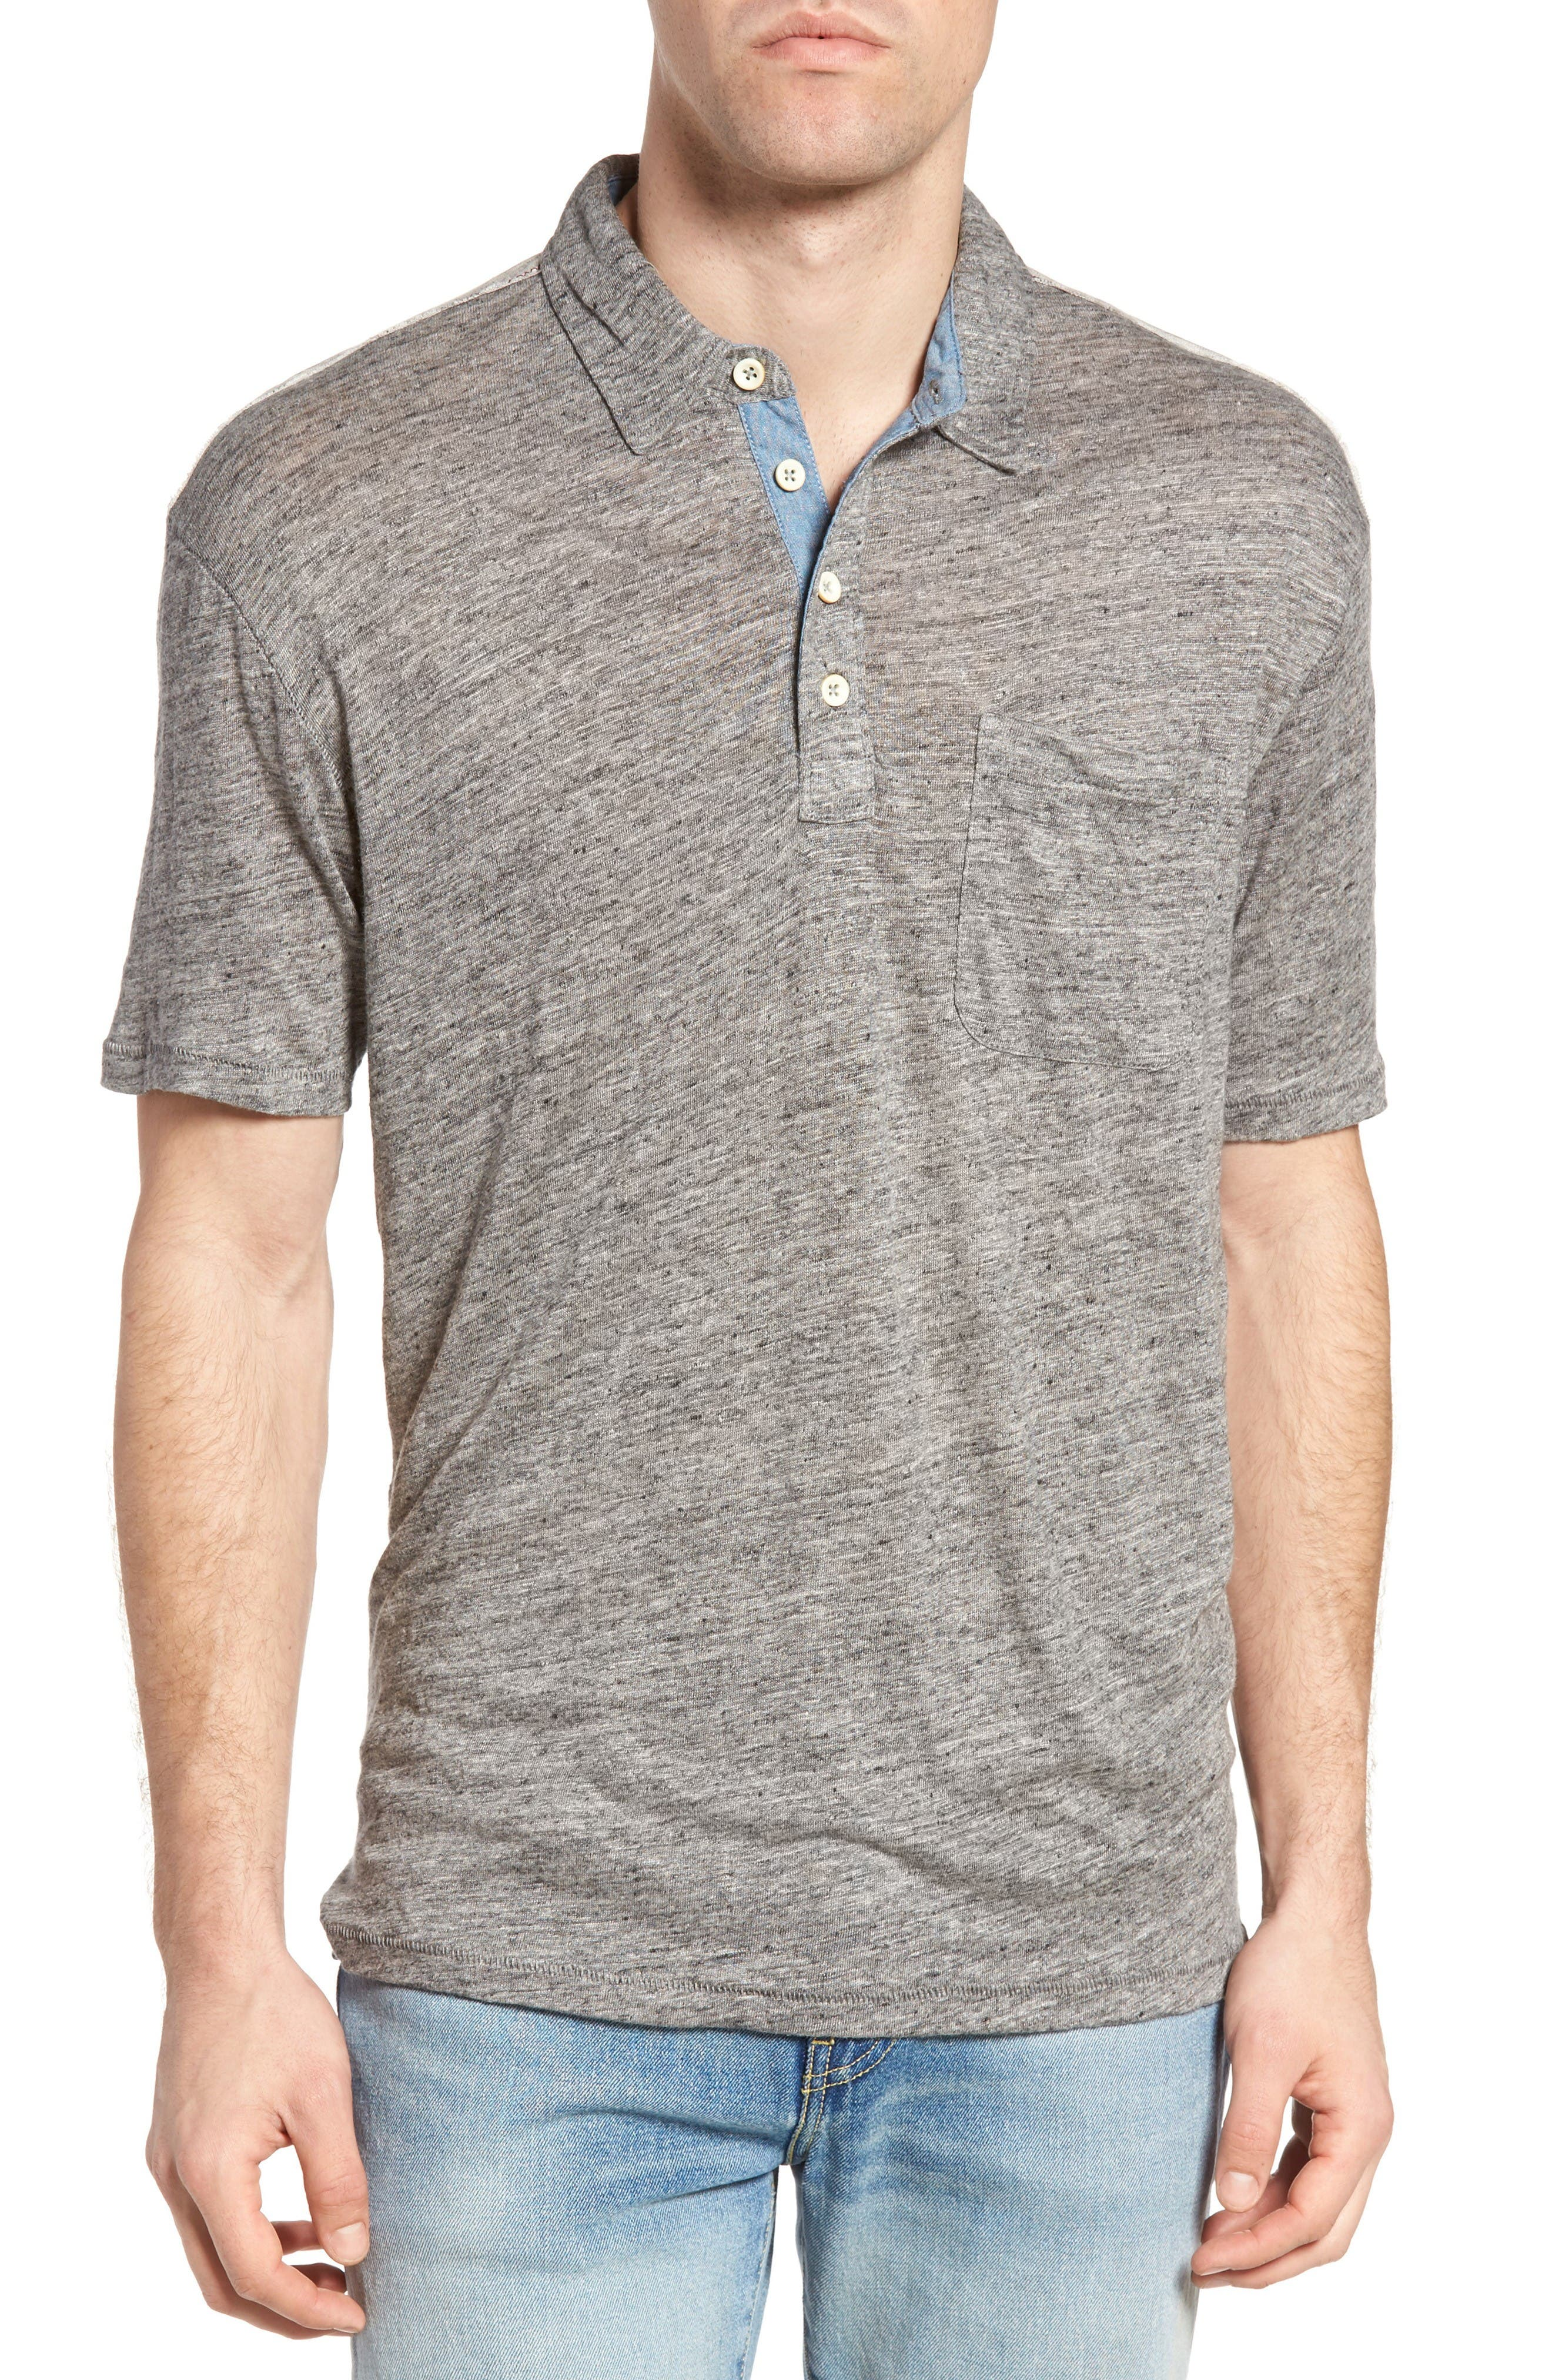 True Grit Colorblock Linen Jersey Polo